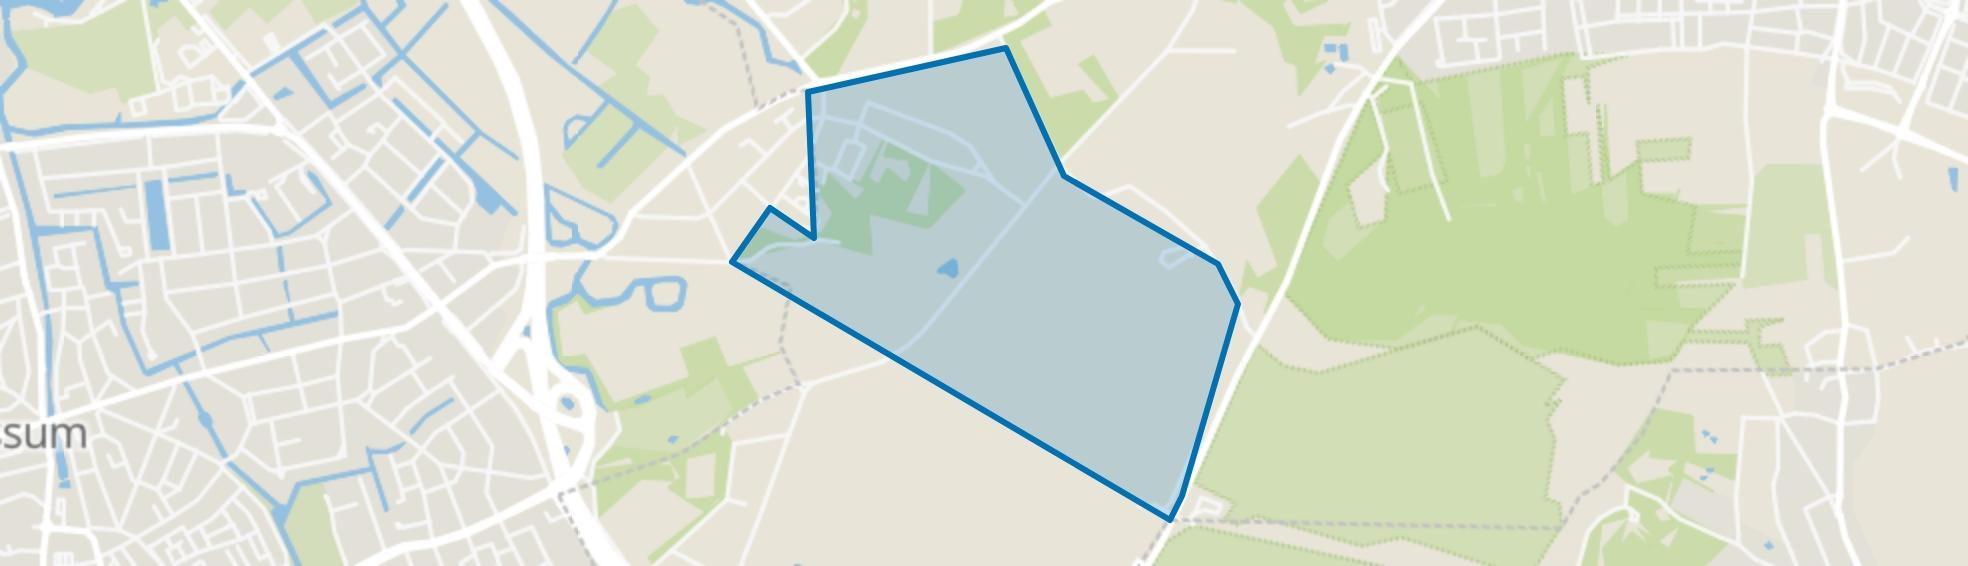 Bikbergen, Huizen map